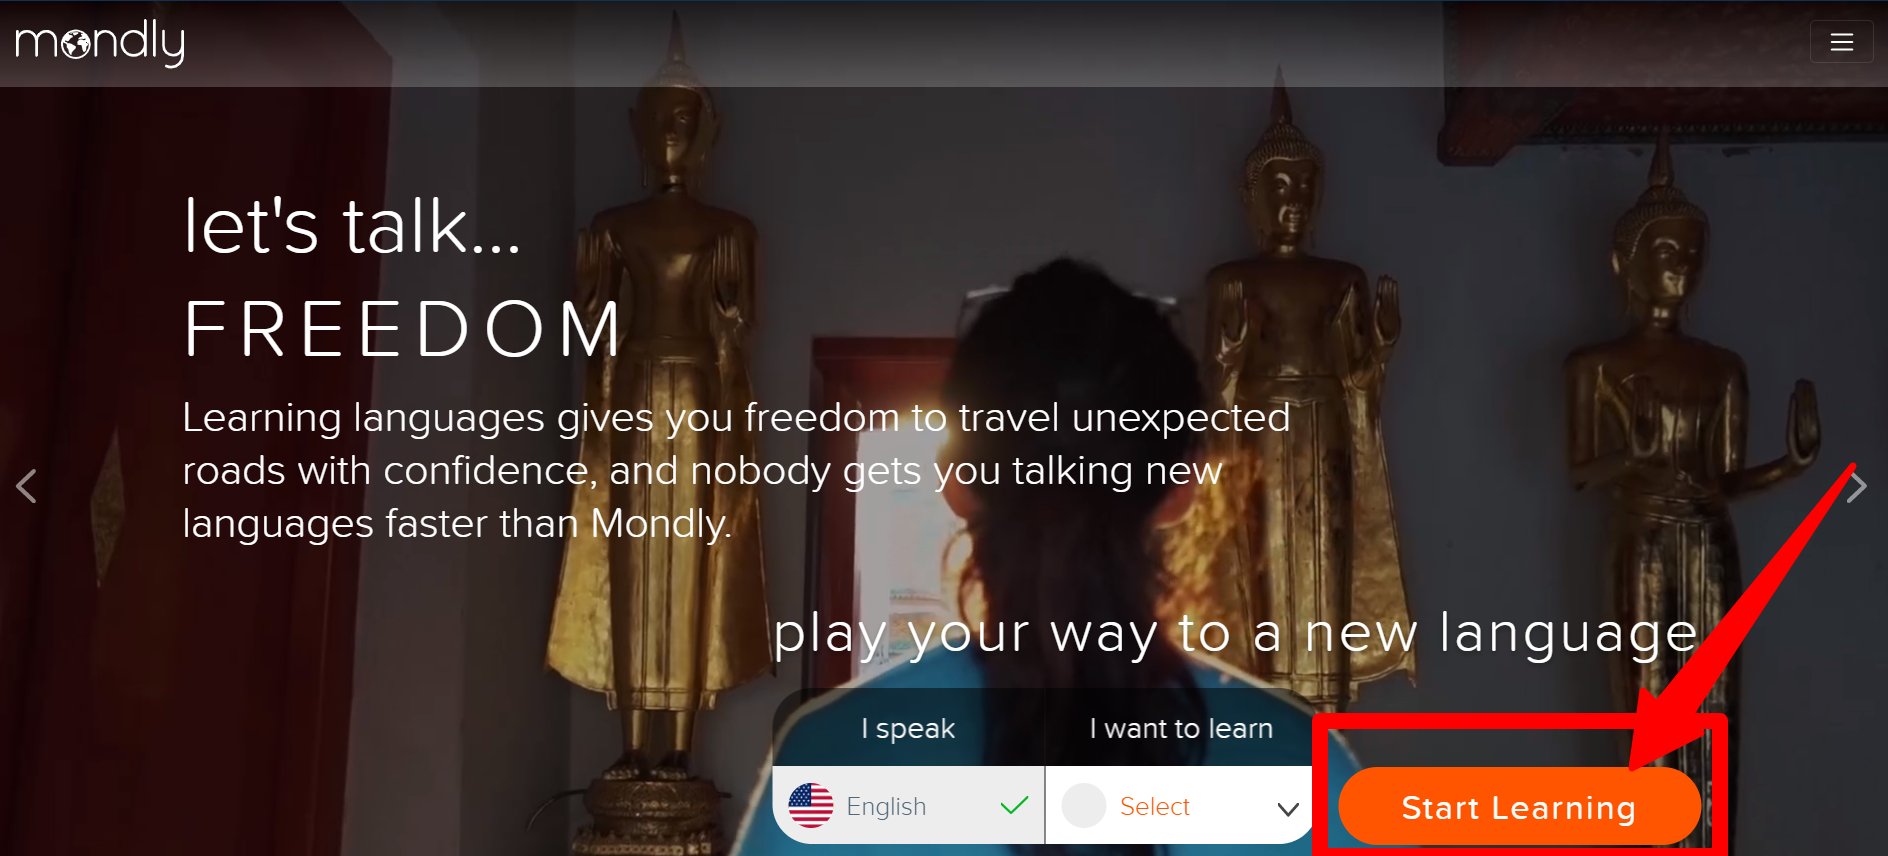 Mondly Vs Duolingo - Mondly